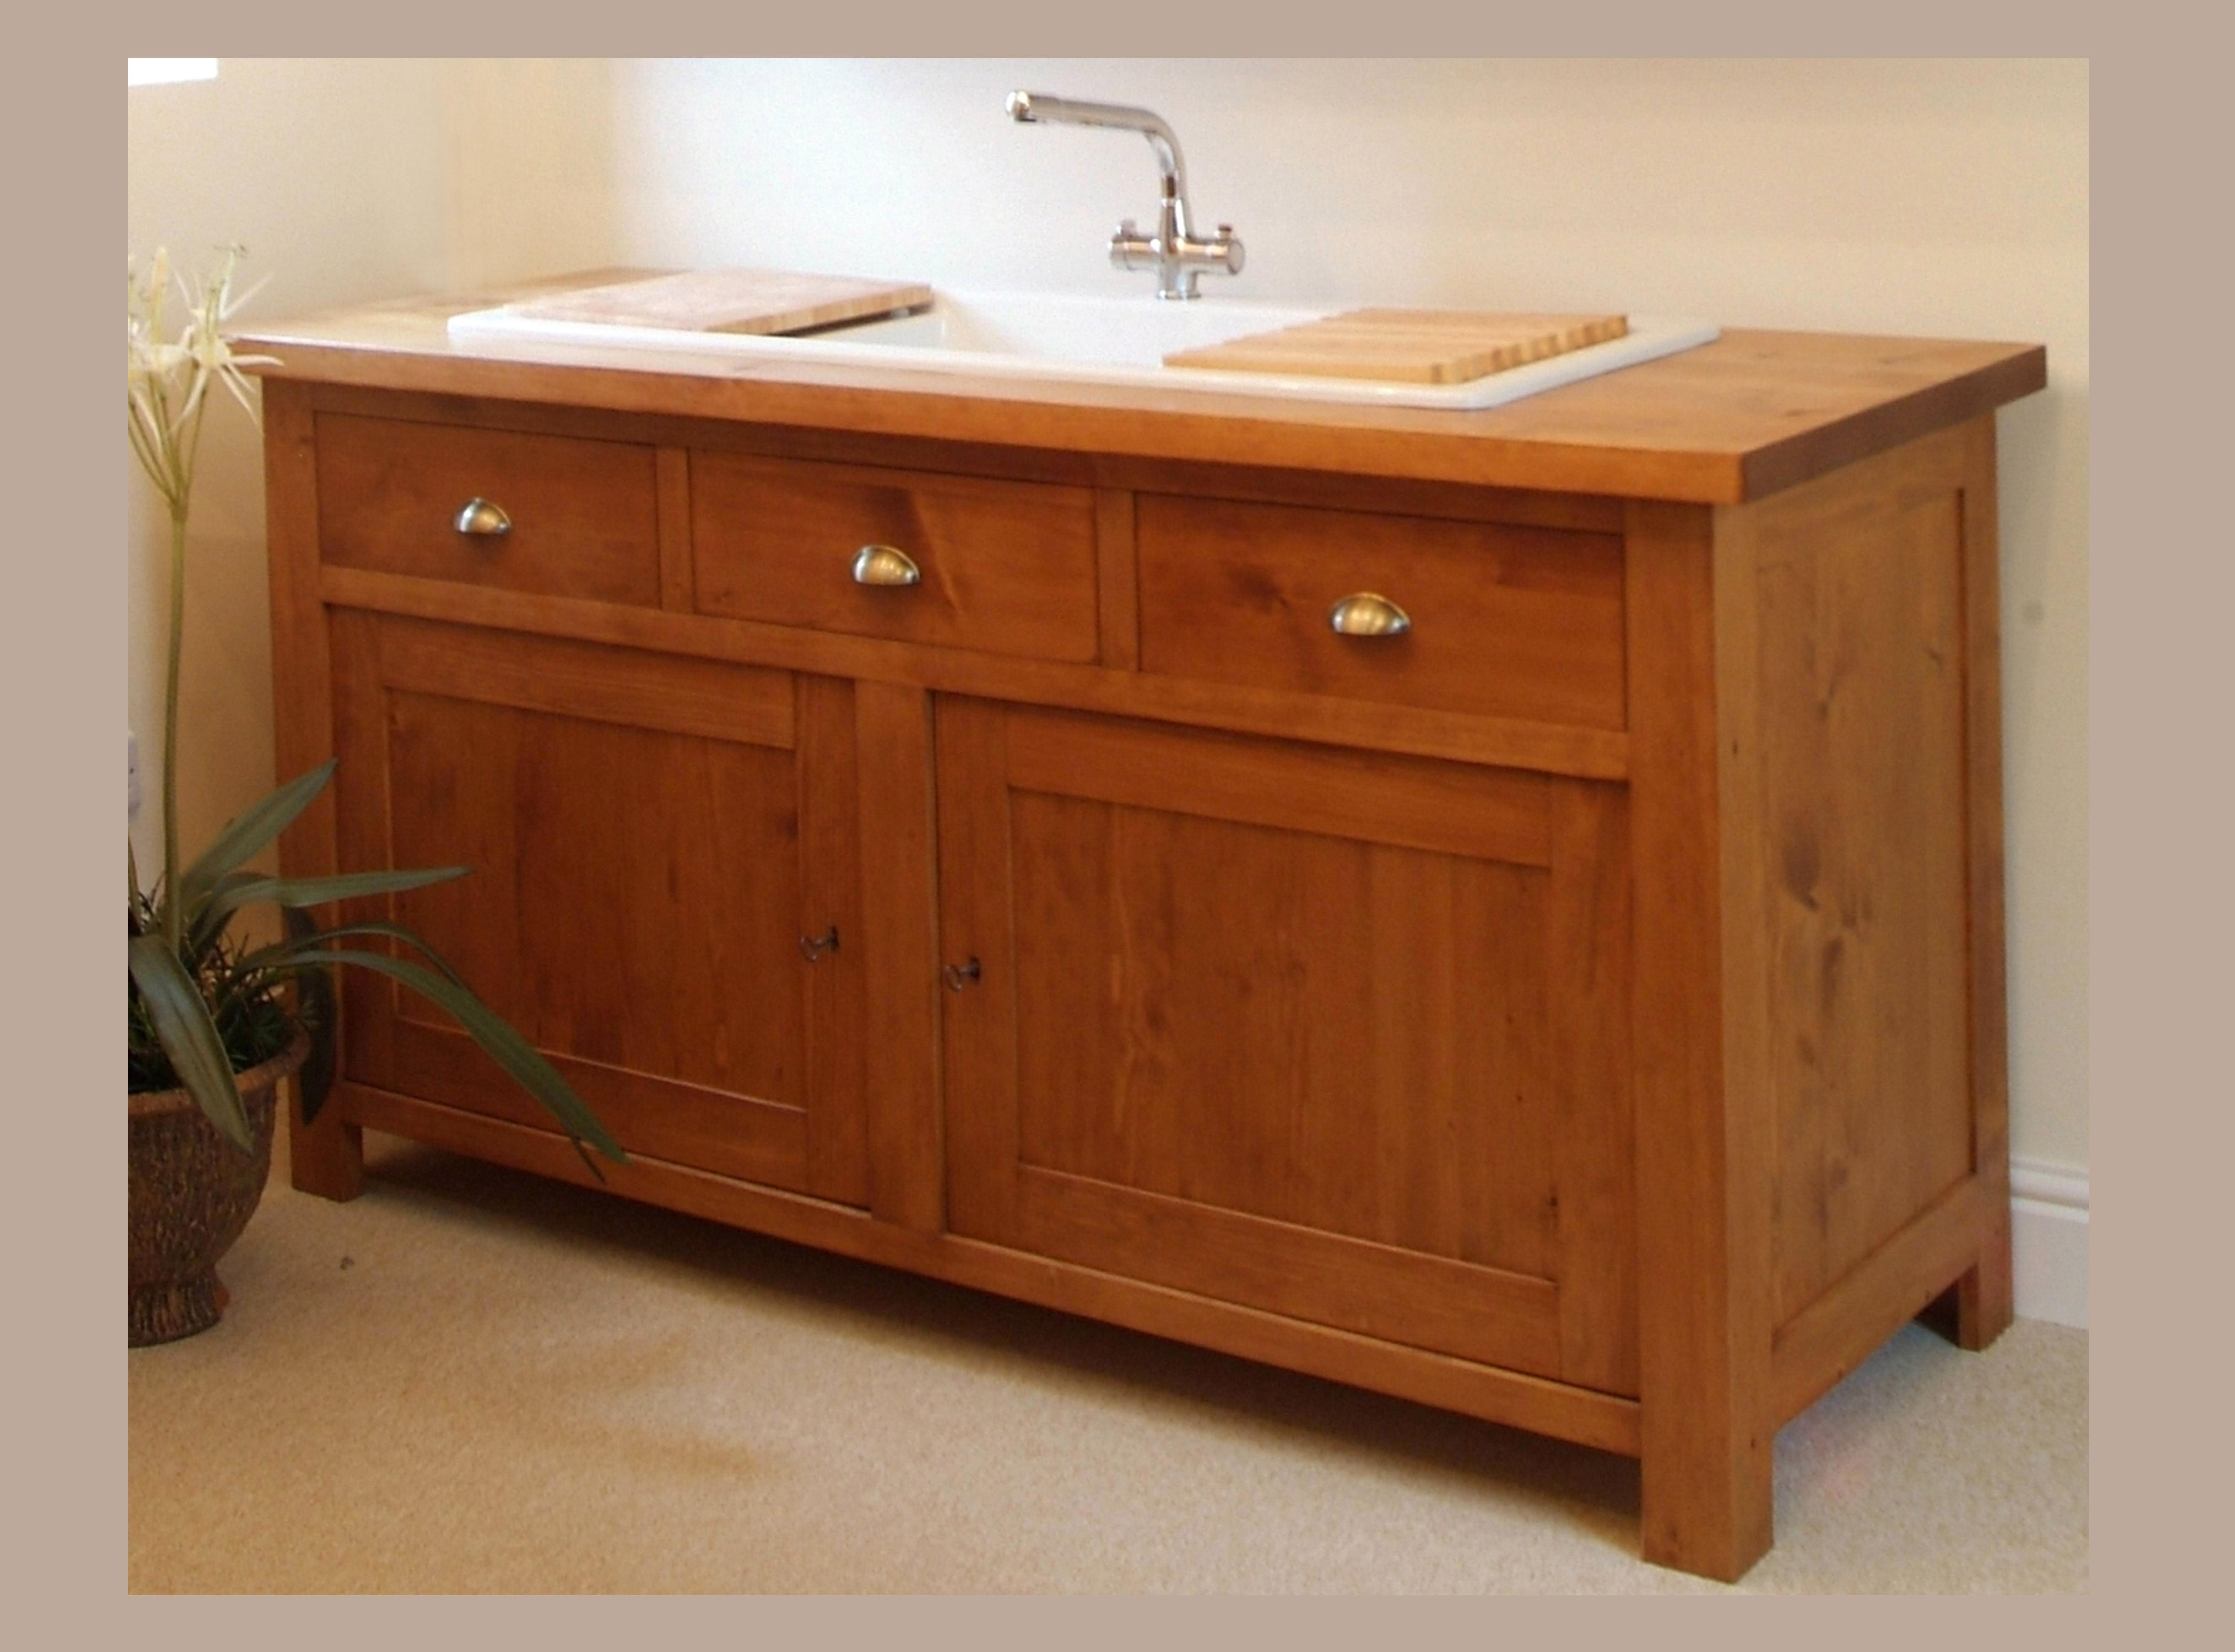 Shaker style freestanding inset sink unit kuchyne bohemian cz